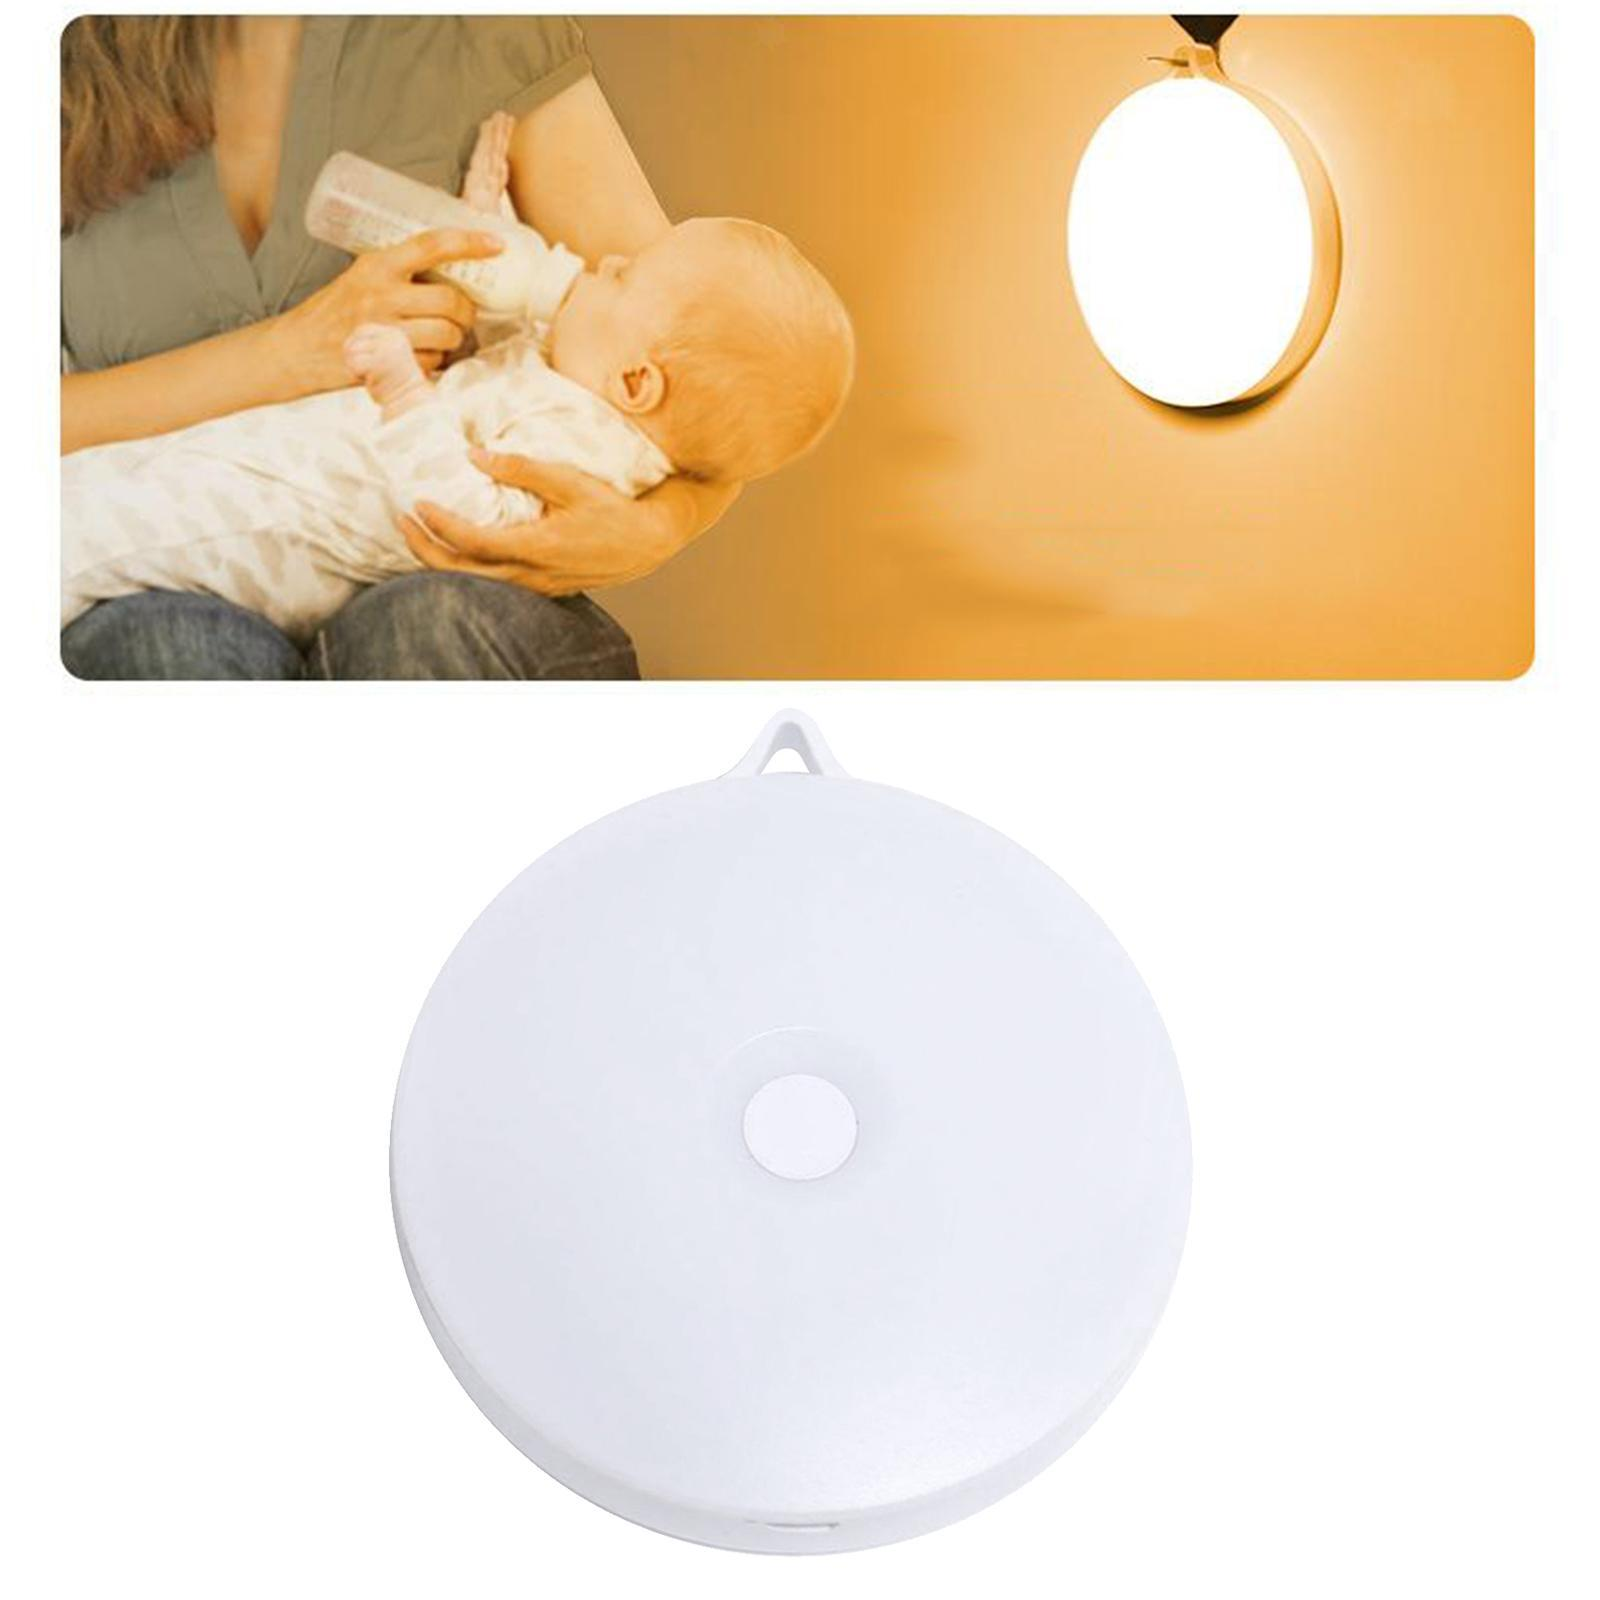 miniatura 6 - Luce notturna a LED per camera da letto ricaricabile USB per Hotel con sensore